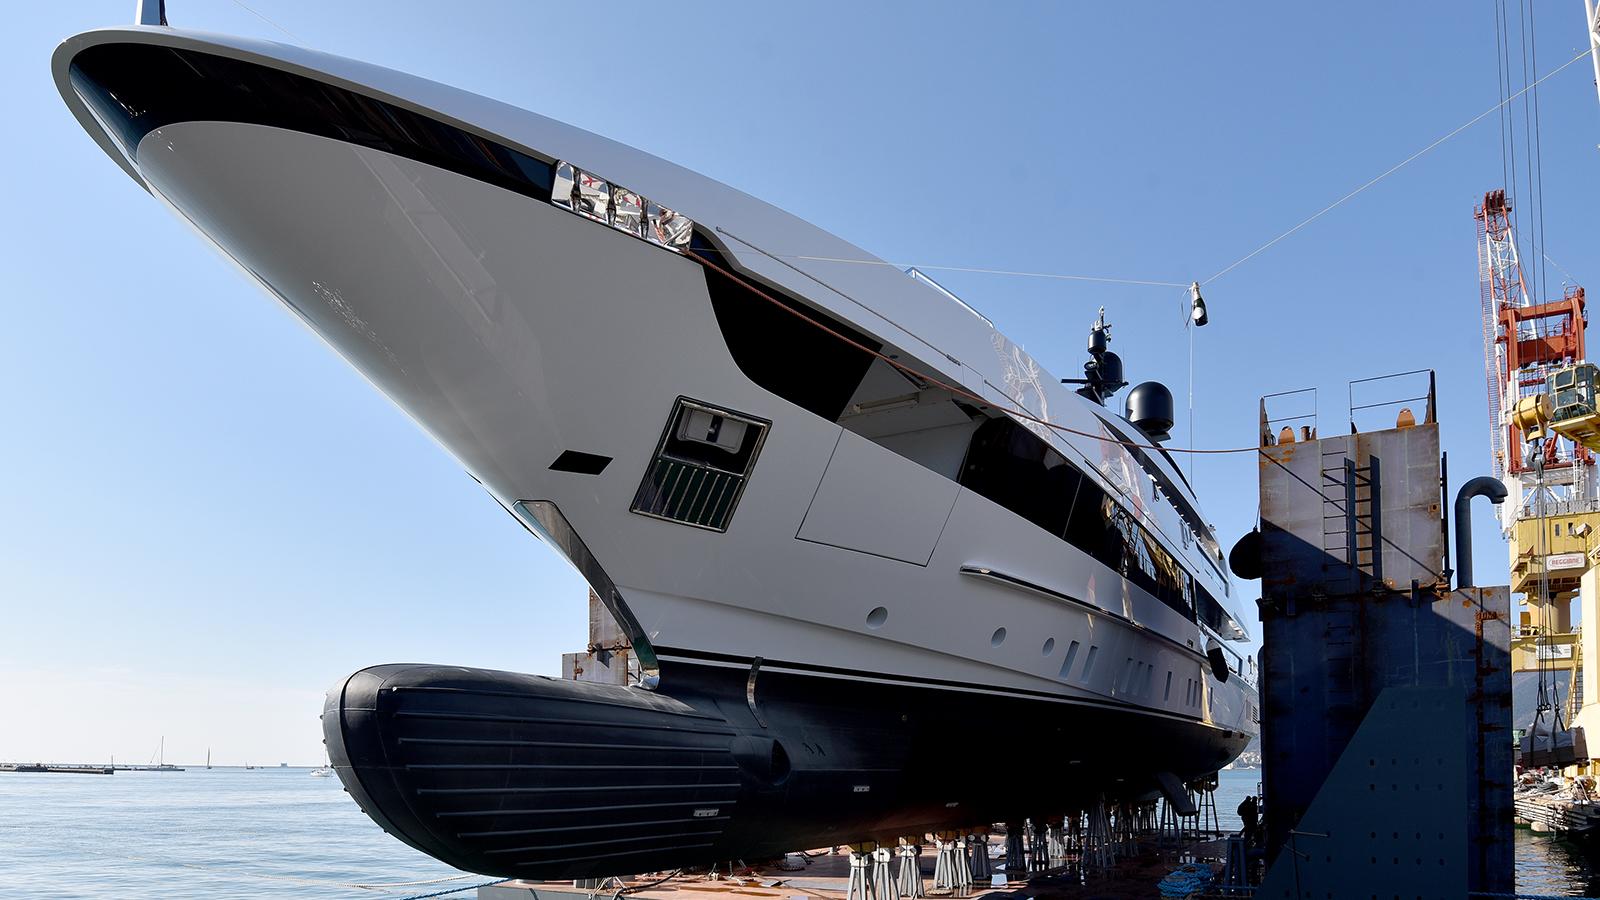 the-second-sanlorenzo-52-steel-yacht-hits-the-water-in-la-spezia